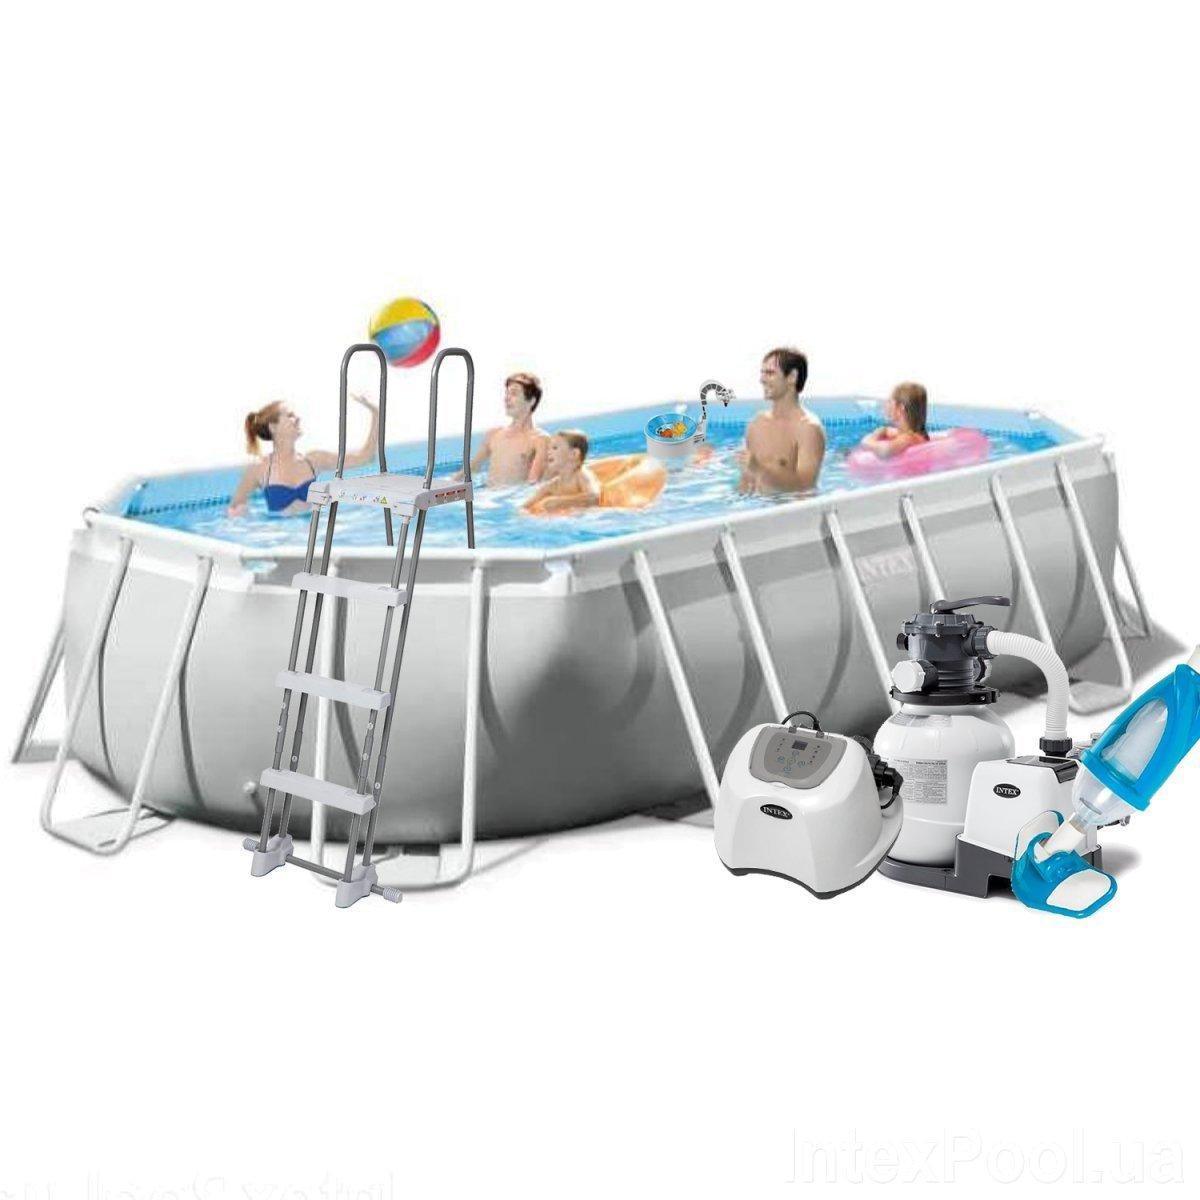 Каркасный бассейн Intex 26796 - 11, 503 x 274 x 122 см (5г/ч, 6 000 л/ч, набор, лестница, тент, подстилка)